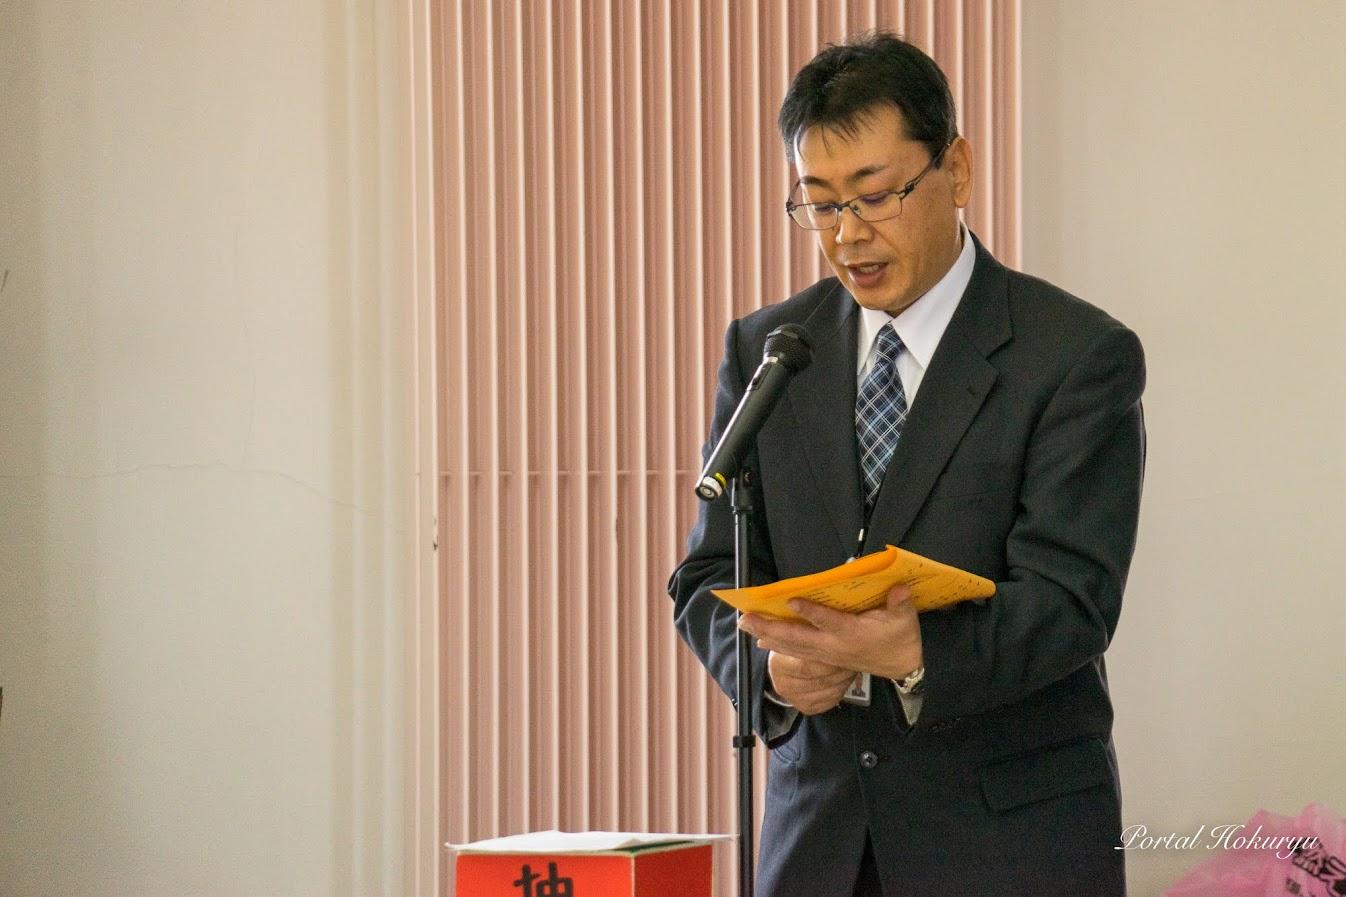 きたそらち農業協同組合金融共済北竜支所金融共済課・太田久志 課長